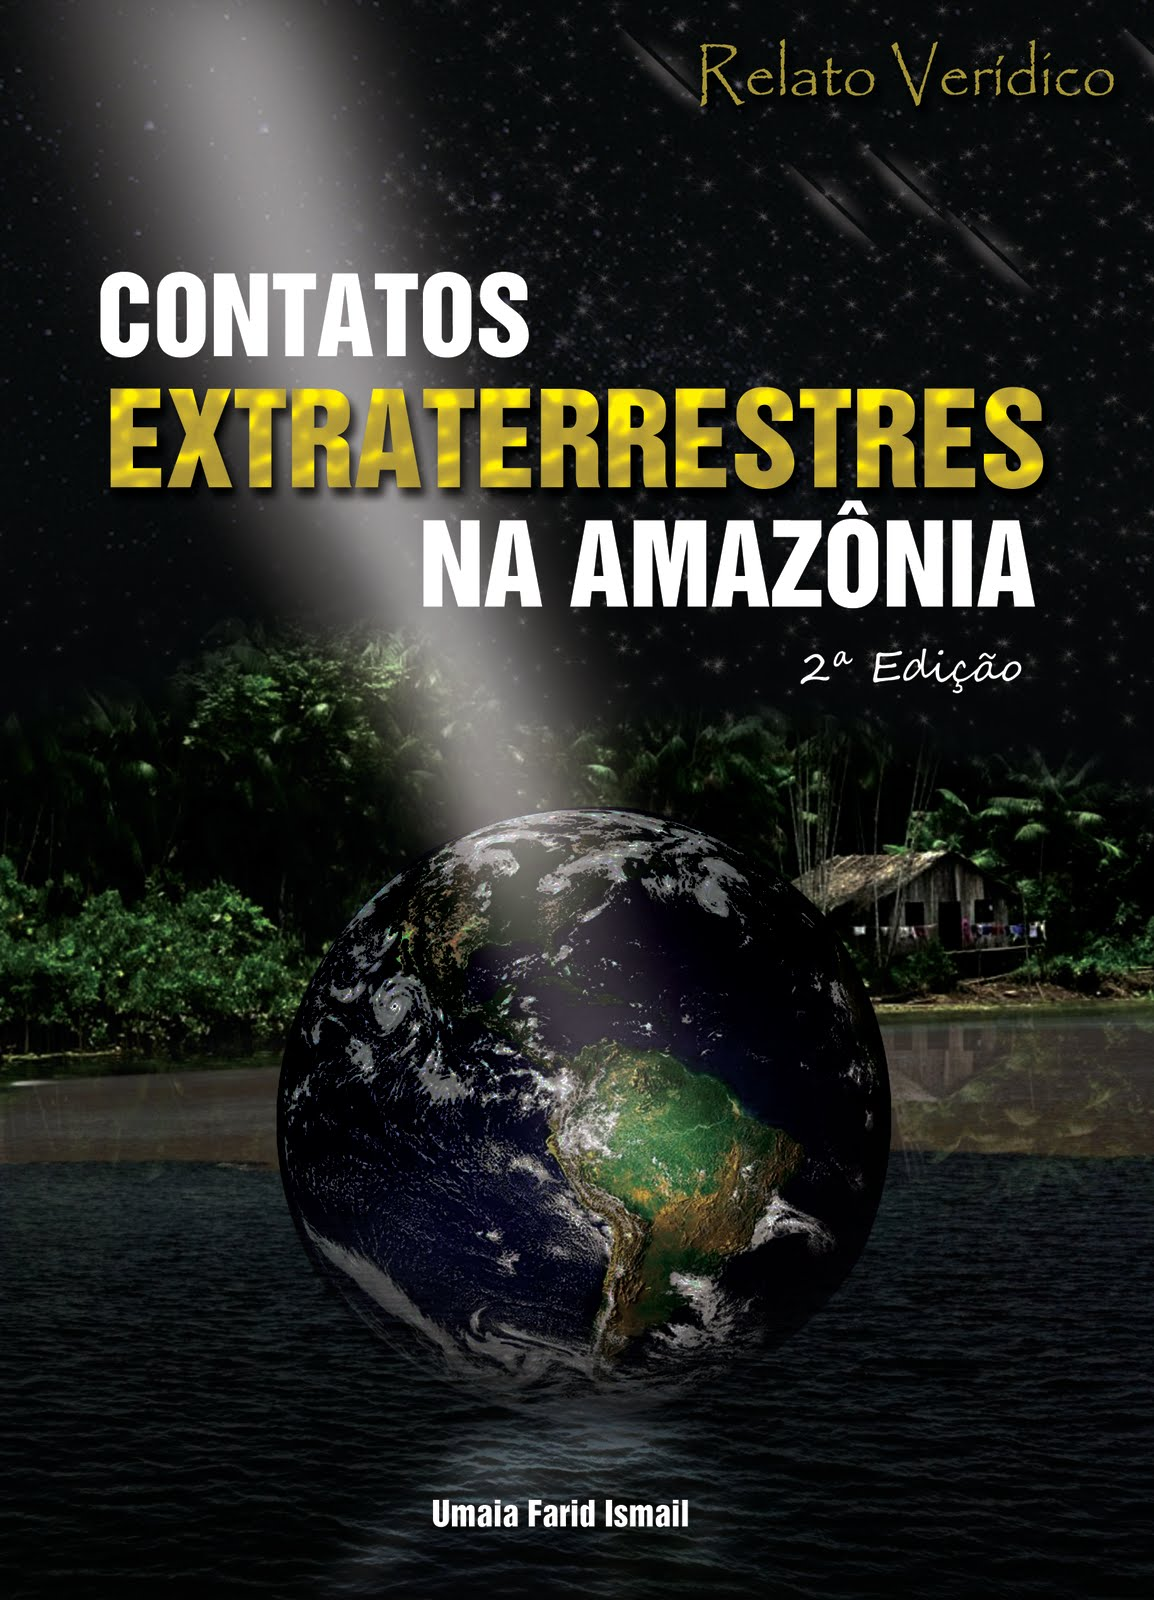 Contatos Extraterrestres